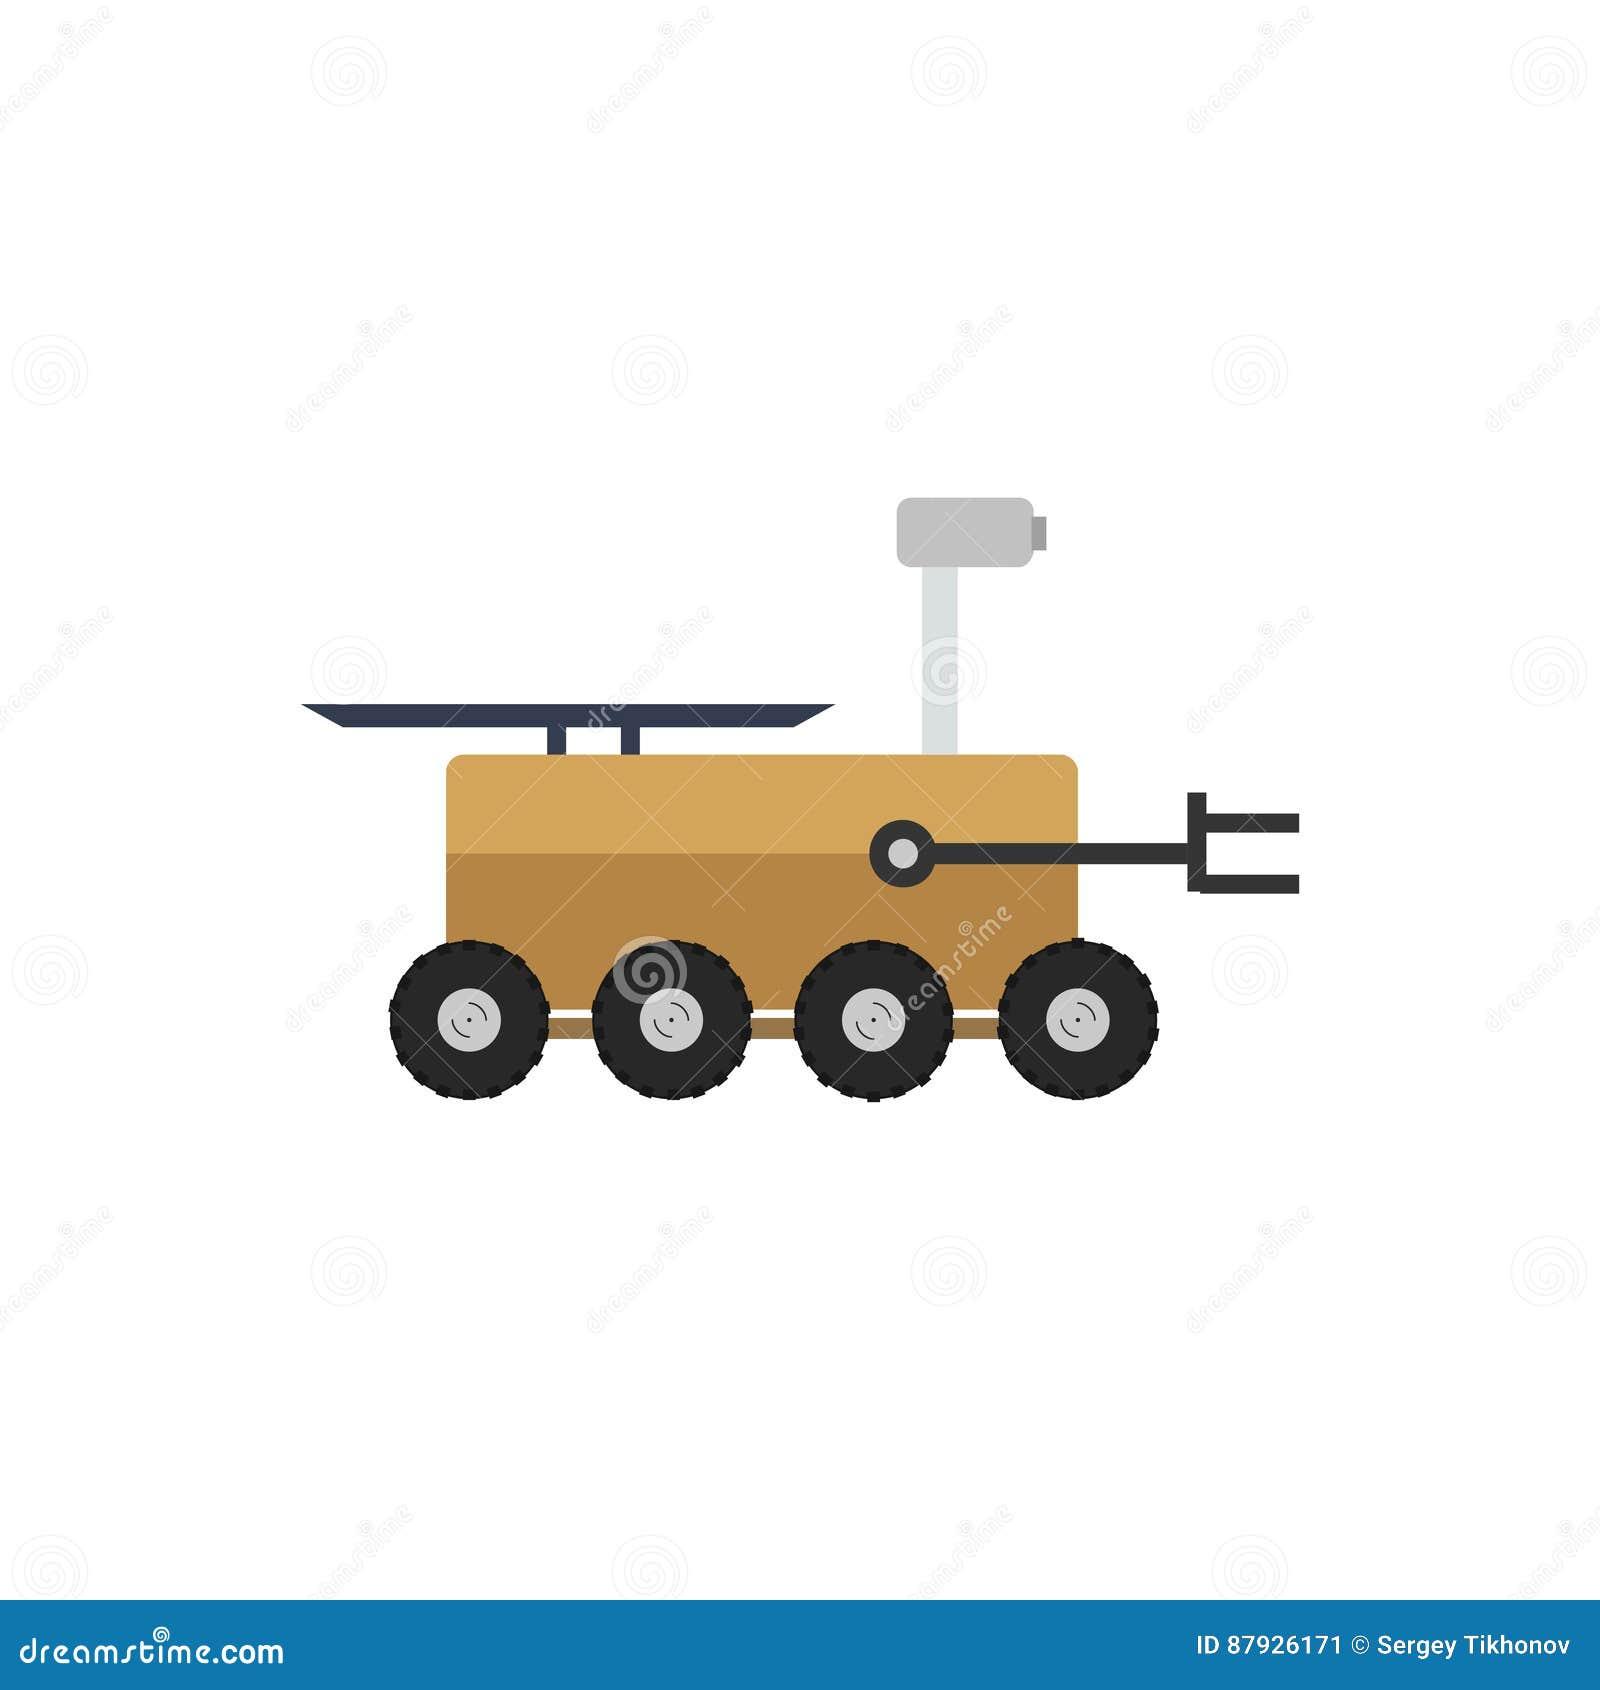 mars rover vector - photo #13